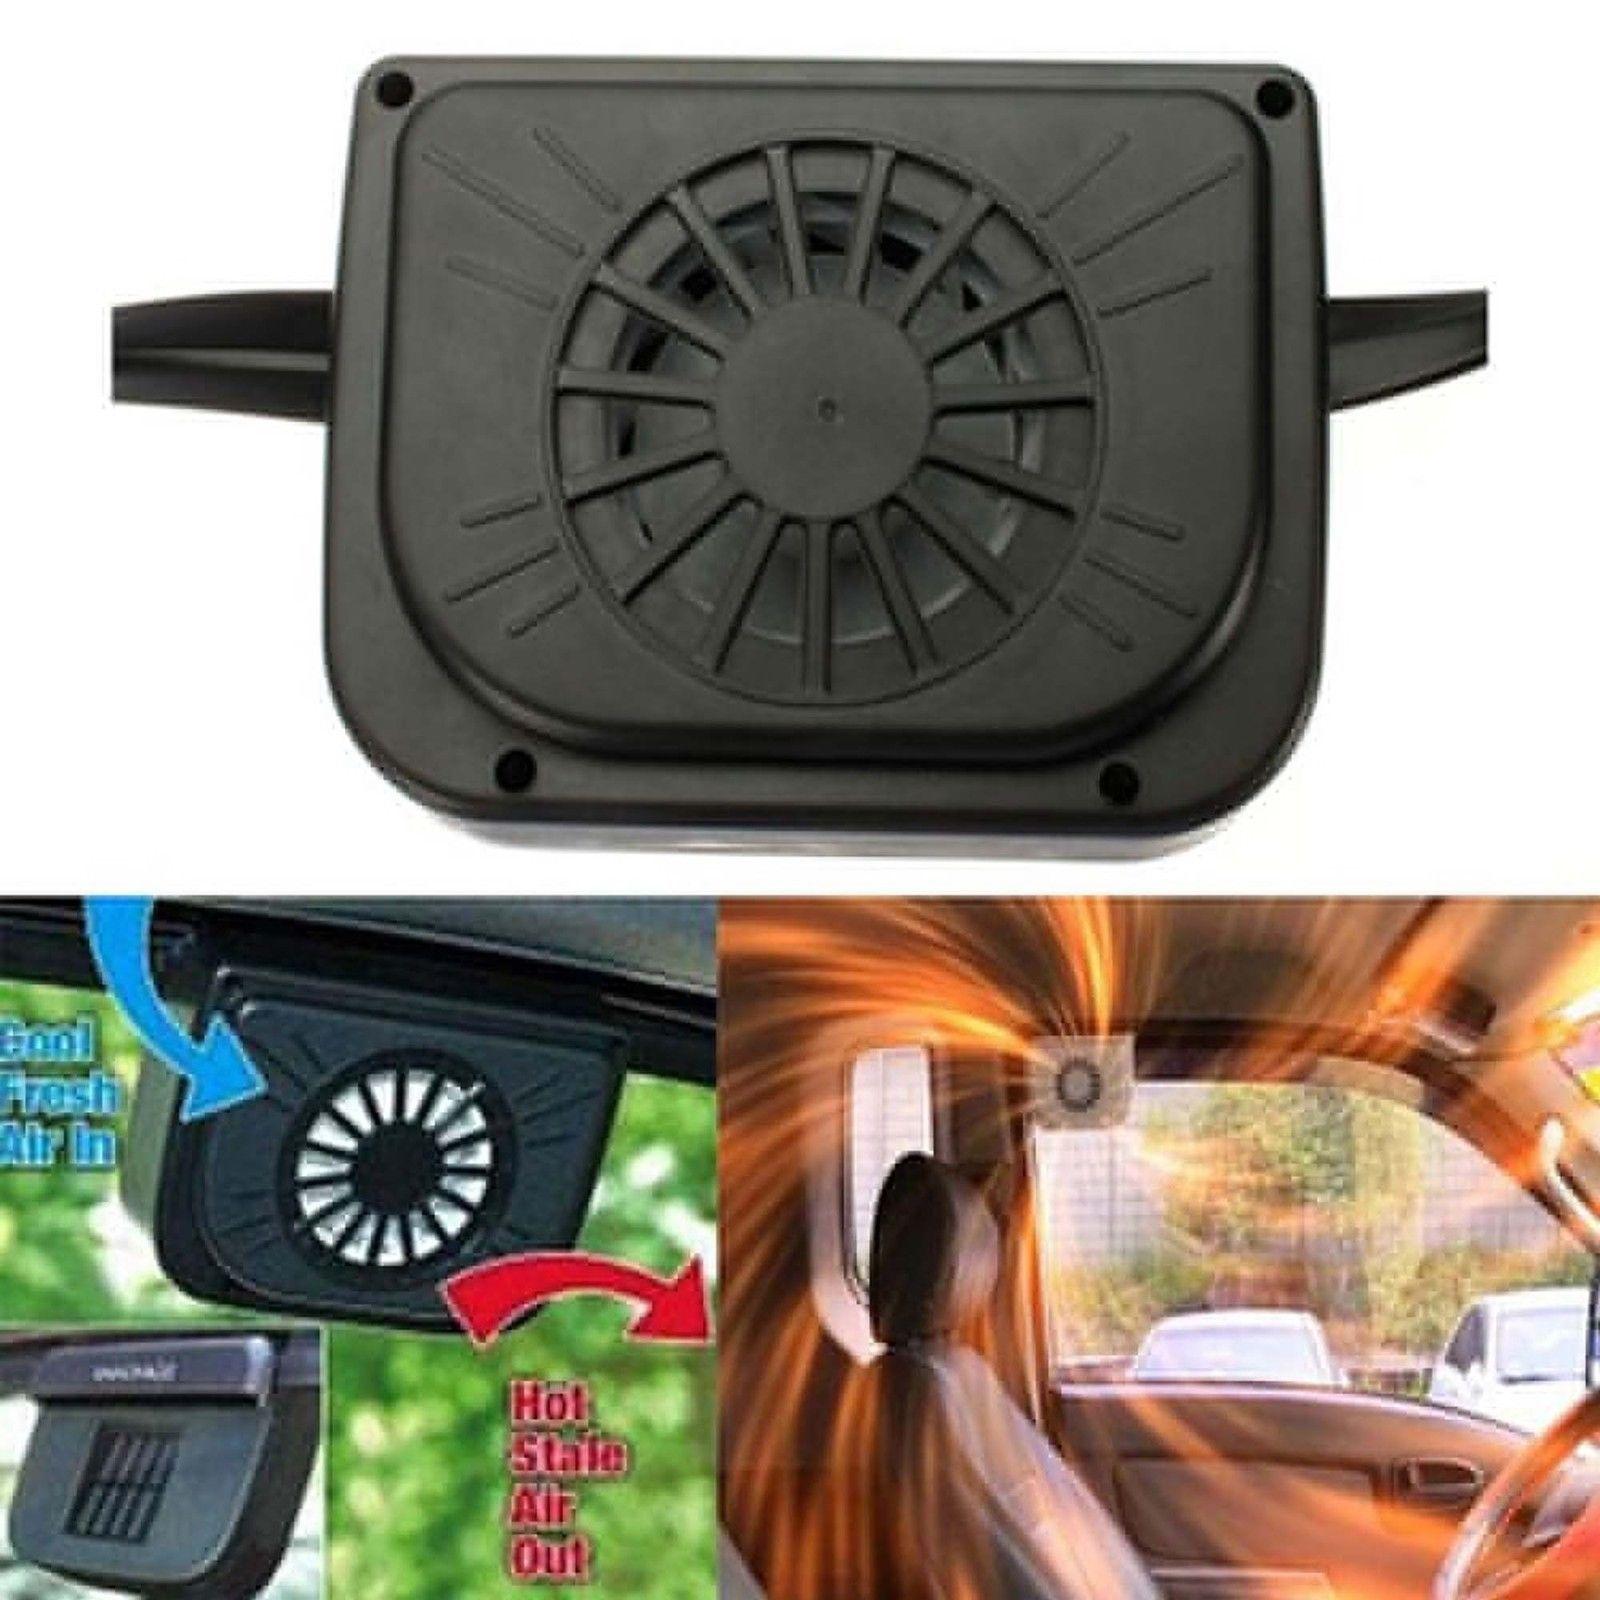 New Solar Powered Har Windows Hoodshield Auto Vent Vent Cooling Вентилятор Охладитель Радиатор Кондиционер Вентиляция Жильс Охладитель